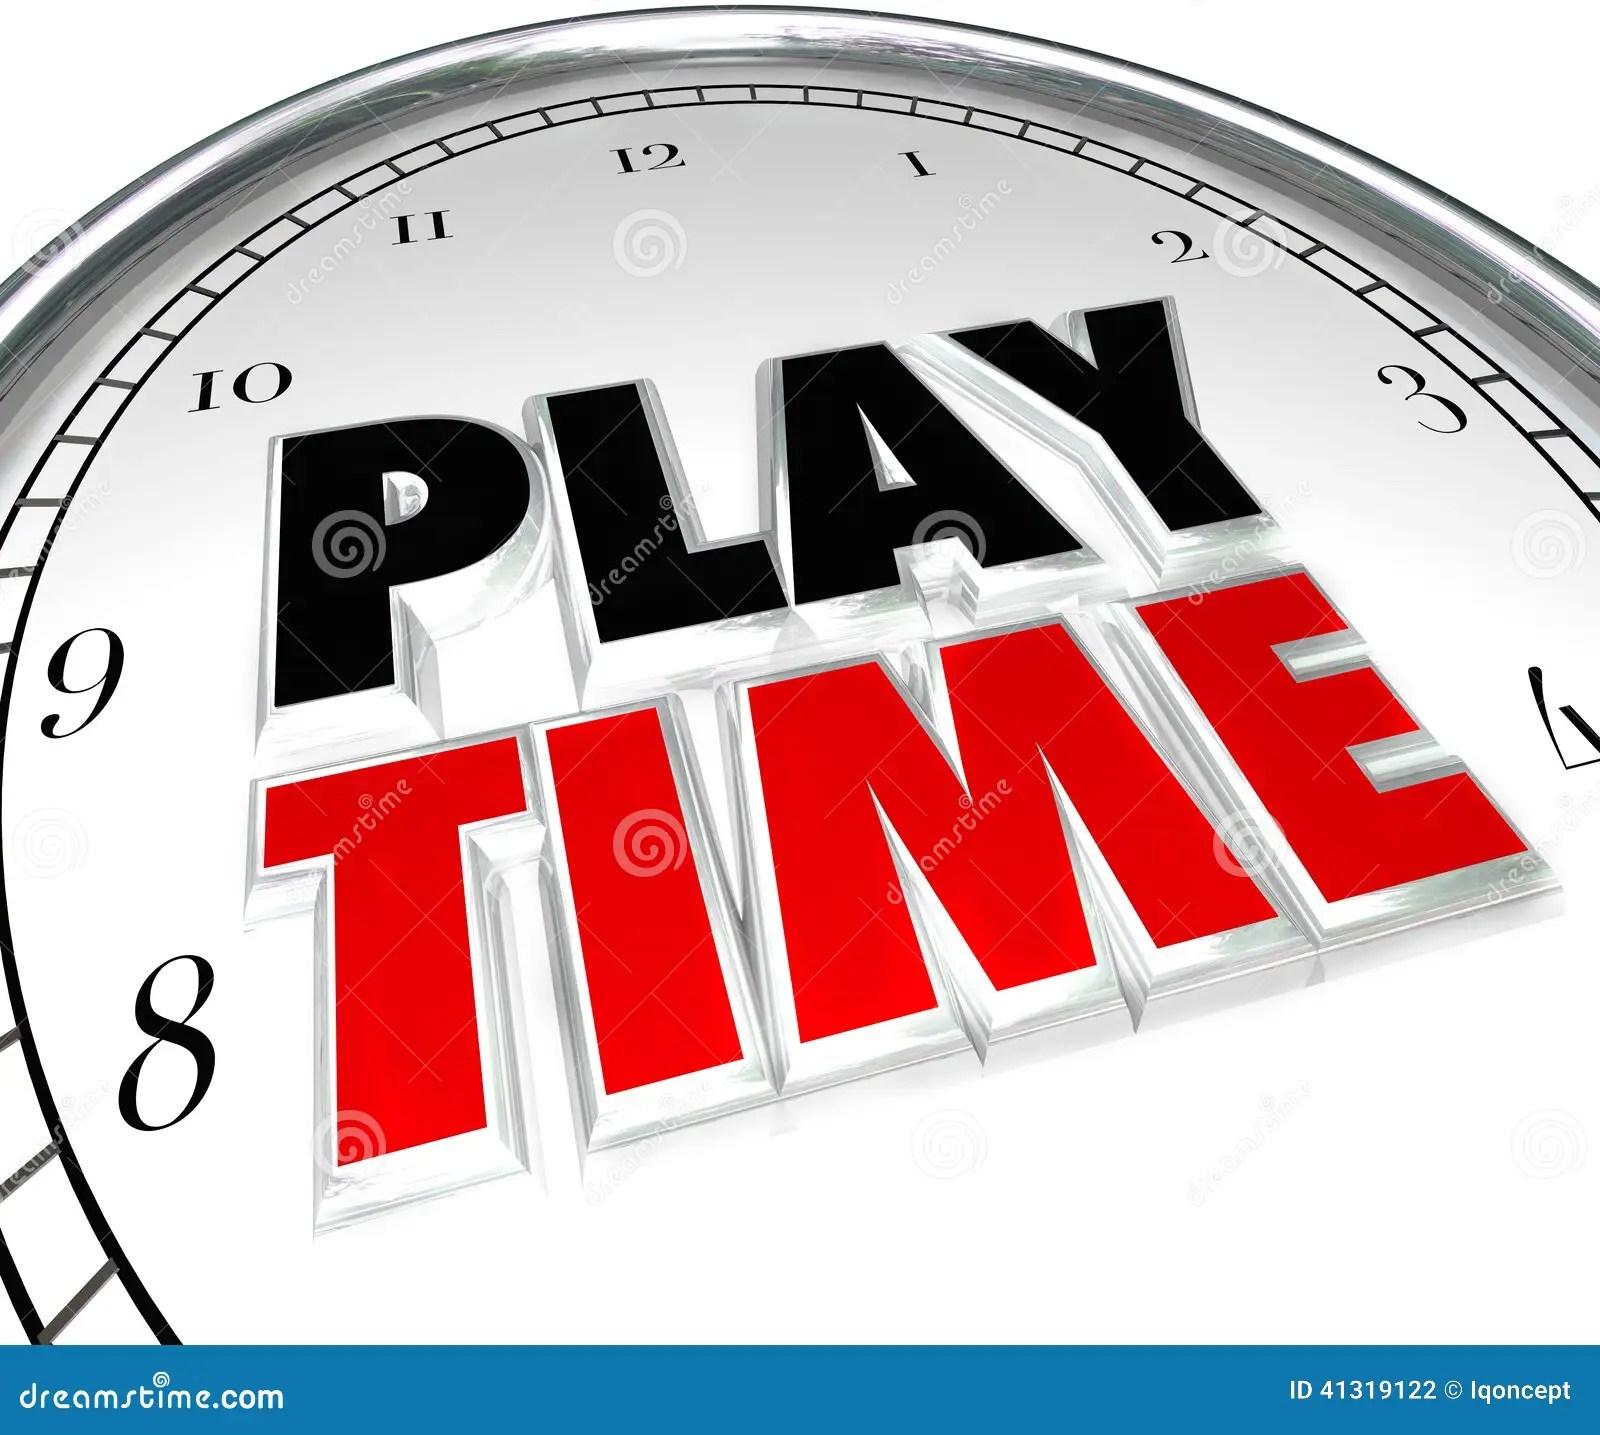 Play Time Clock Fun Recreation Recess Sports Activity Stock Illustration